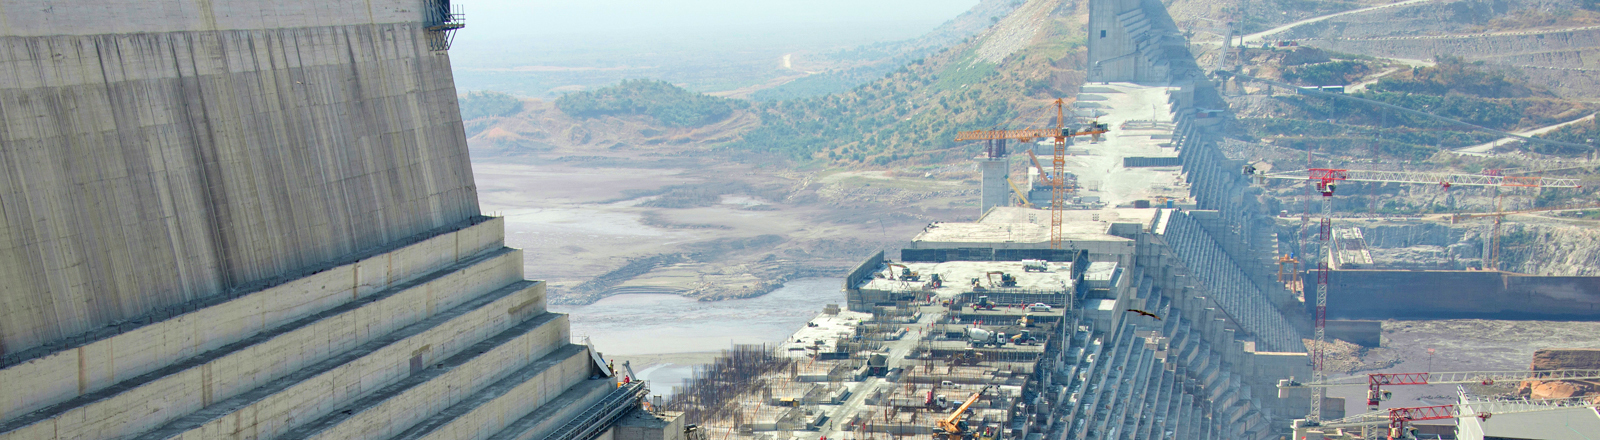 Die Baustelle des Grand-Ethiopian-Renaissance-Dam 2017